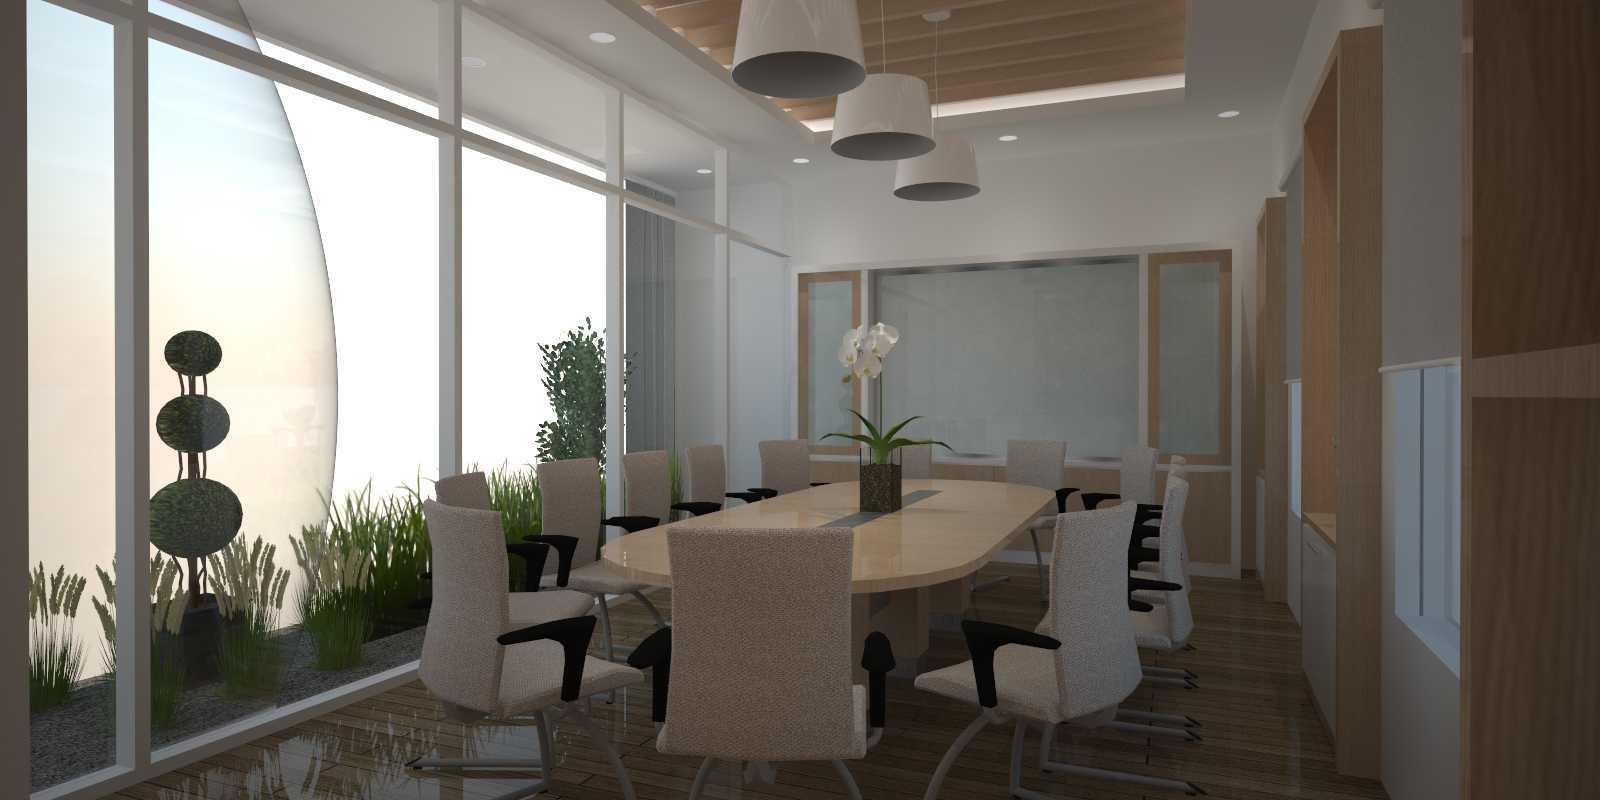 Saichul Ludvi Jasa Marga Office Jakarta Jakarta Meeting-3 Modern  27319